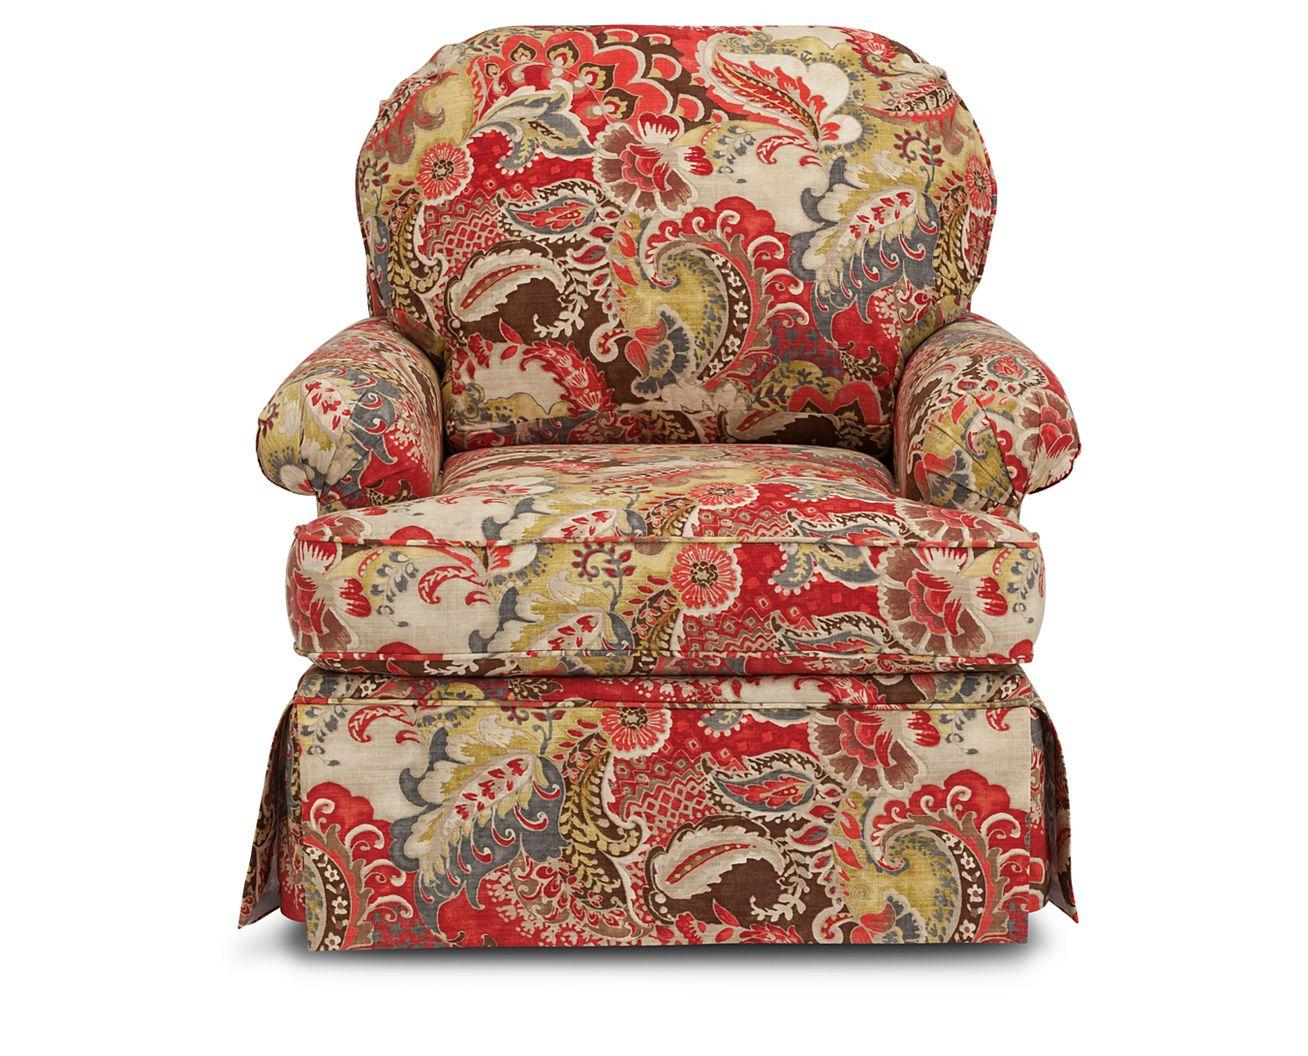 Sofa Mart Davenport Ia By 100 Mishawaka American Freight Furniture And